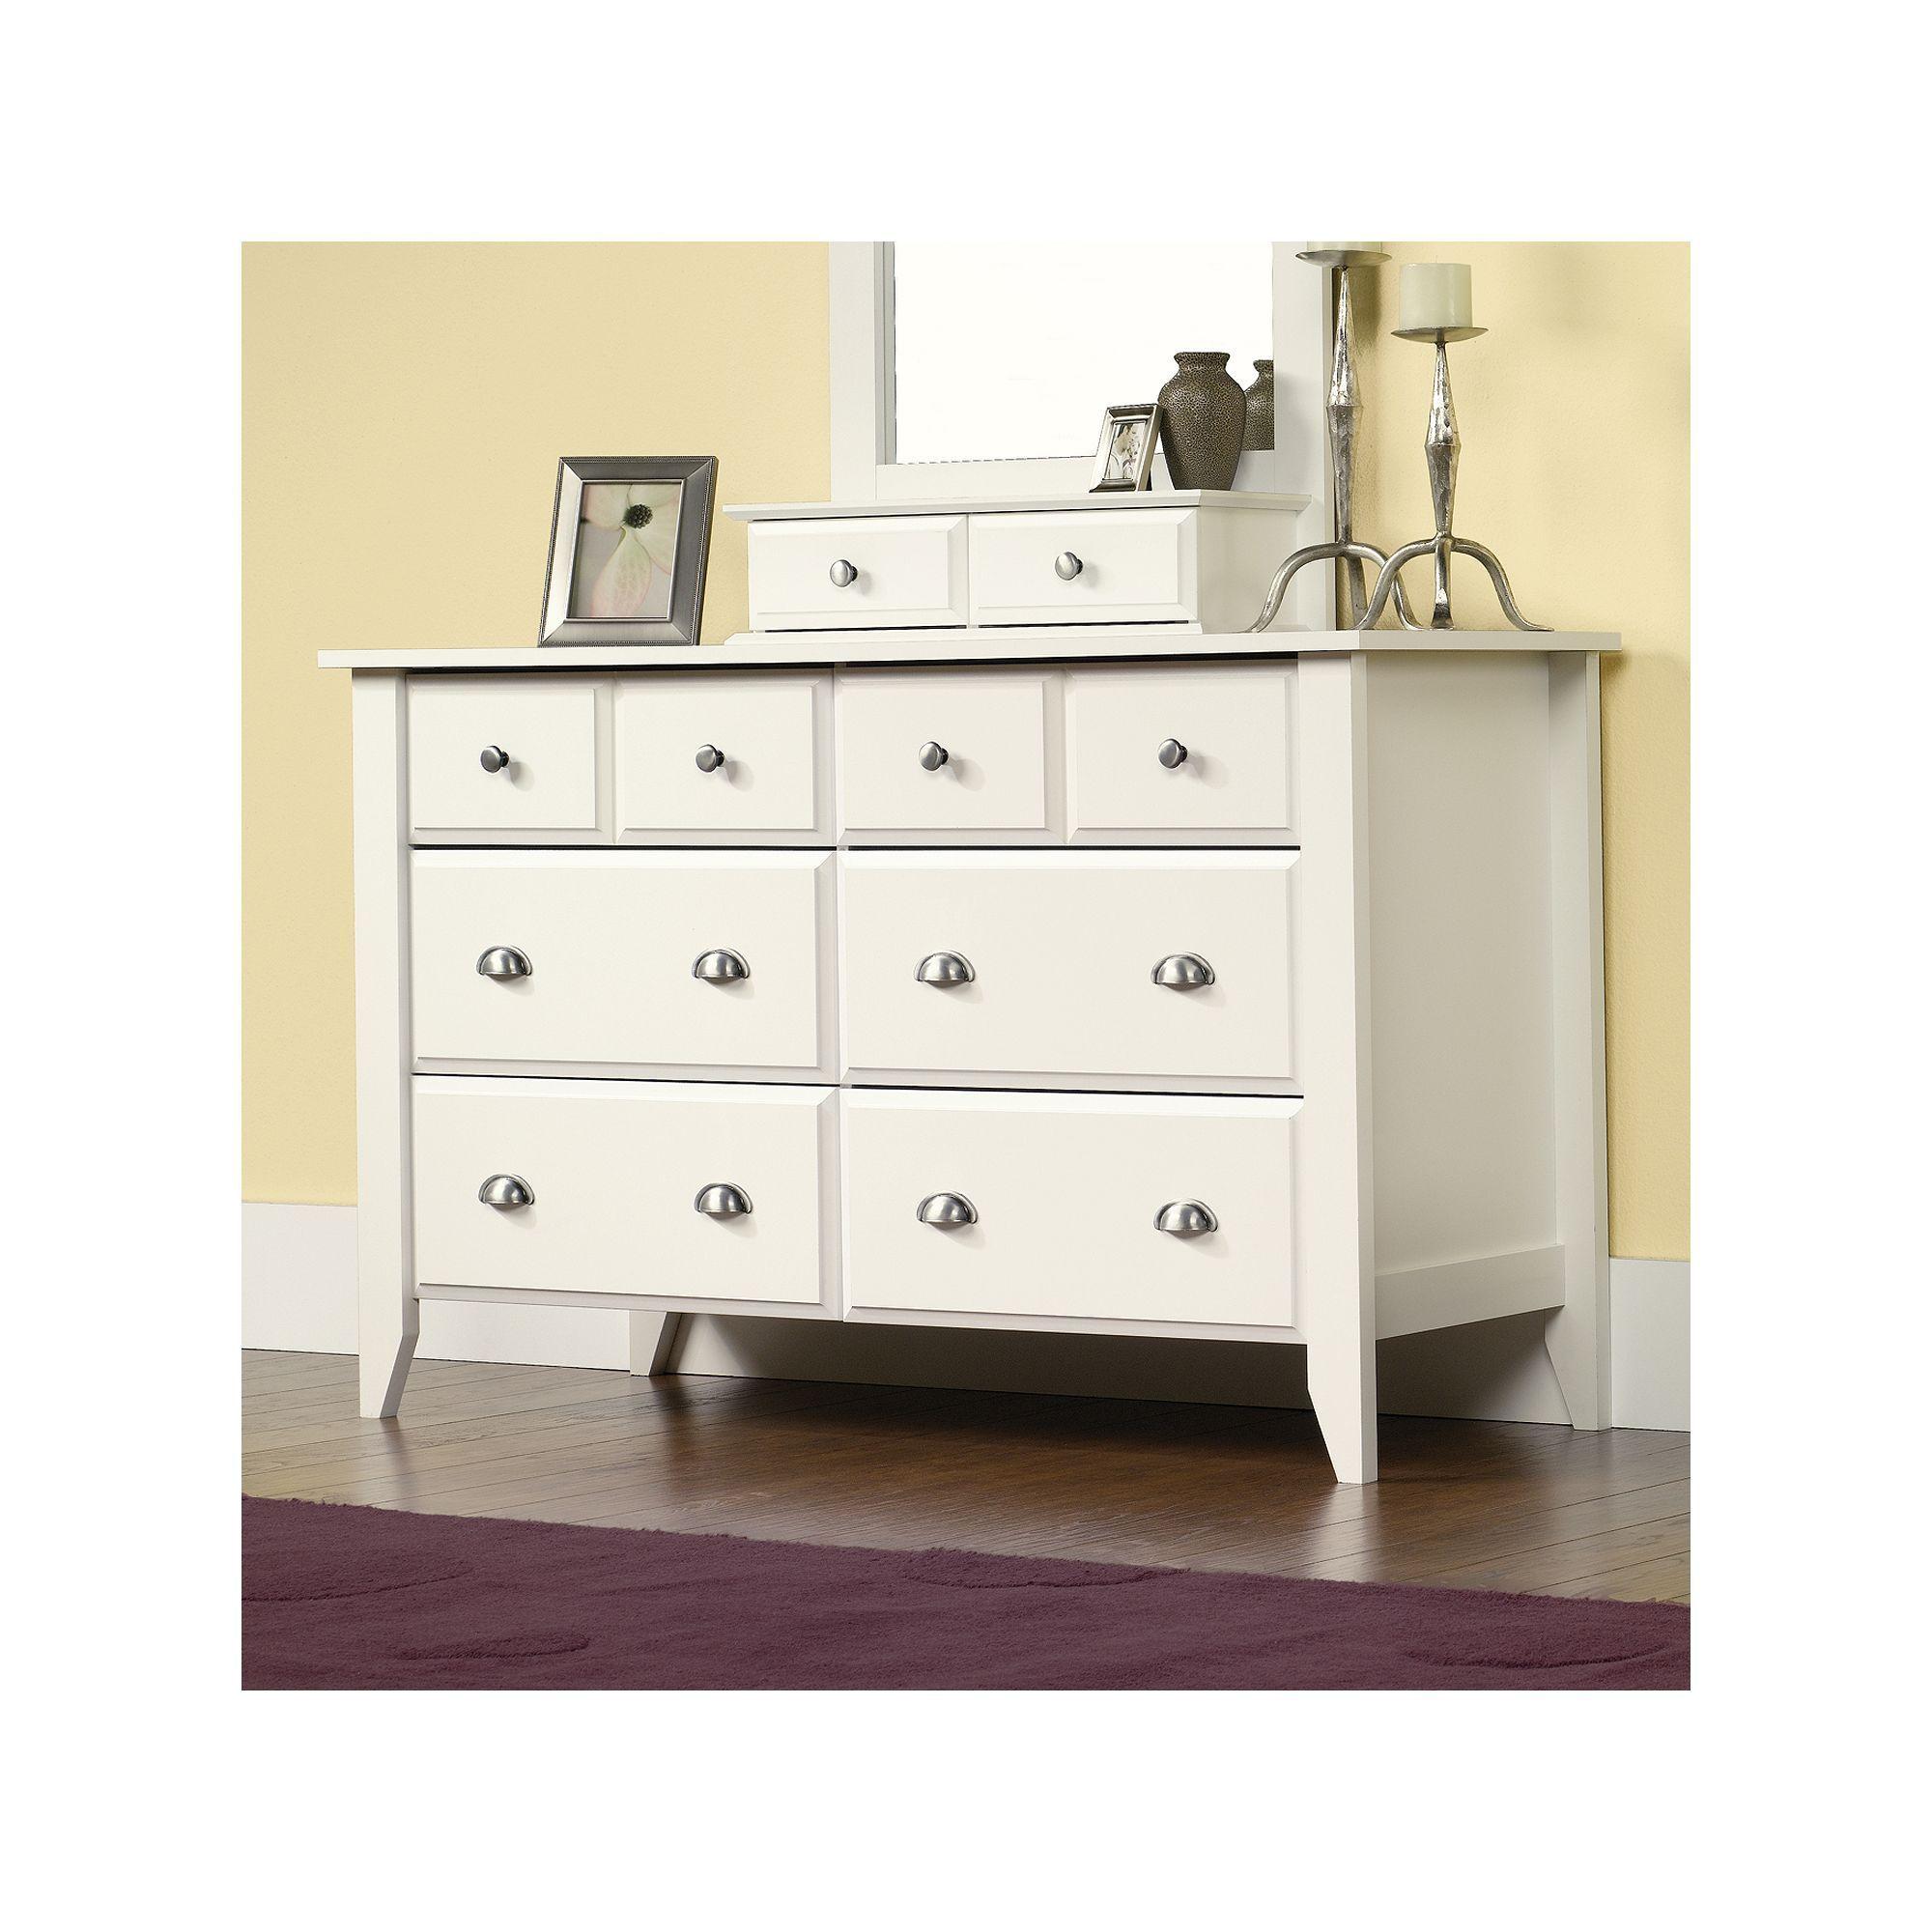 Best Sauder Shoal Creek Dresser Dresser With Mirror Dresser 400 x 300